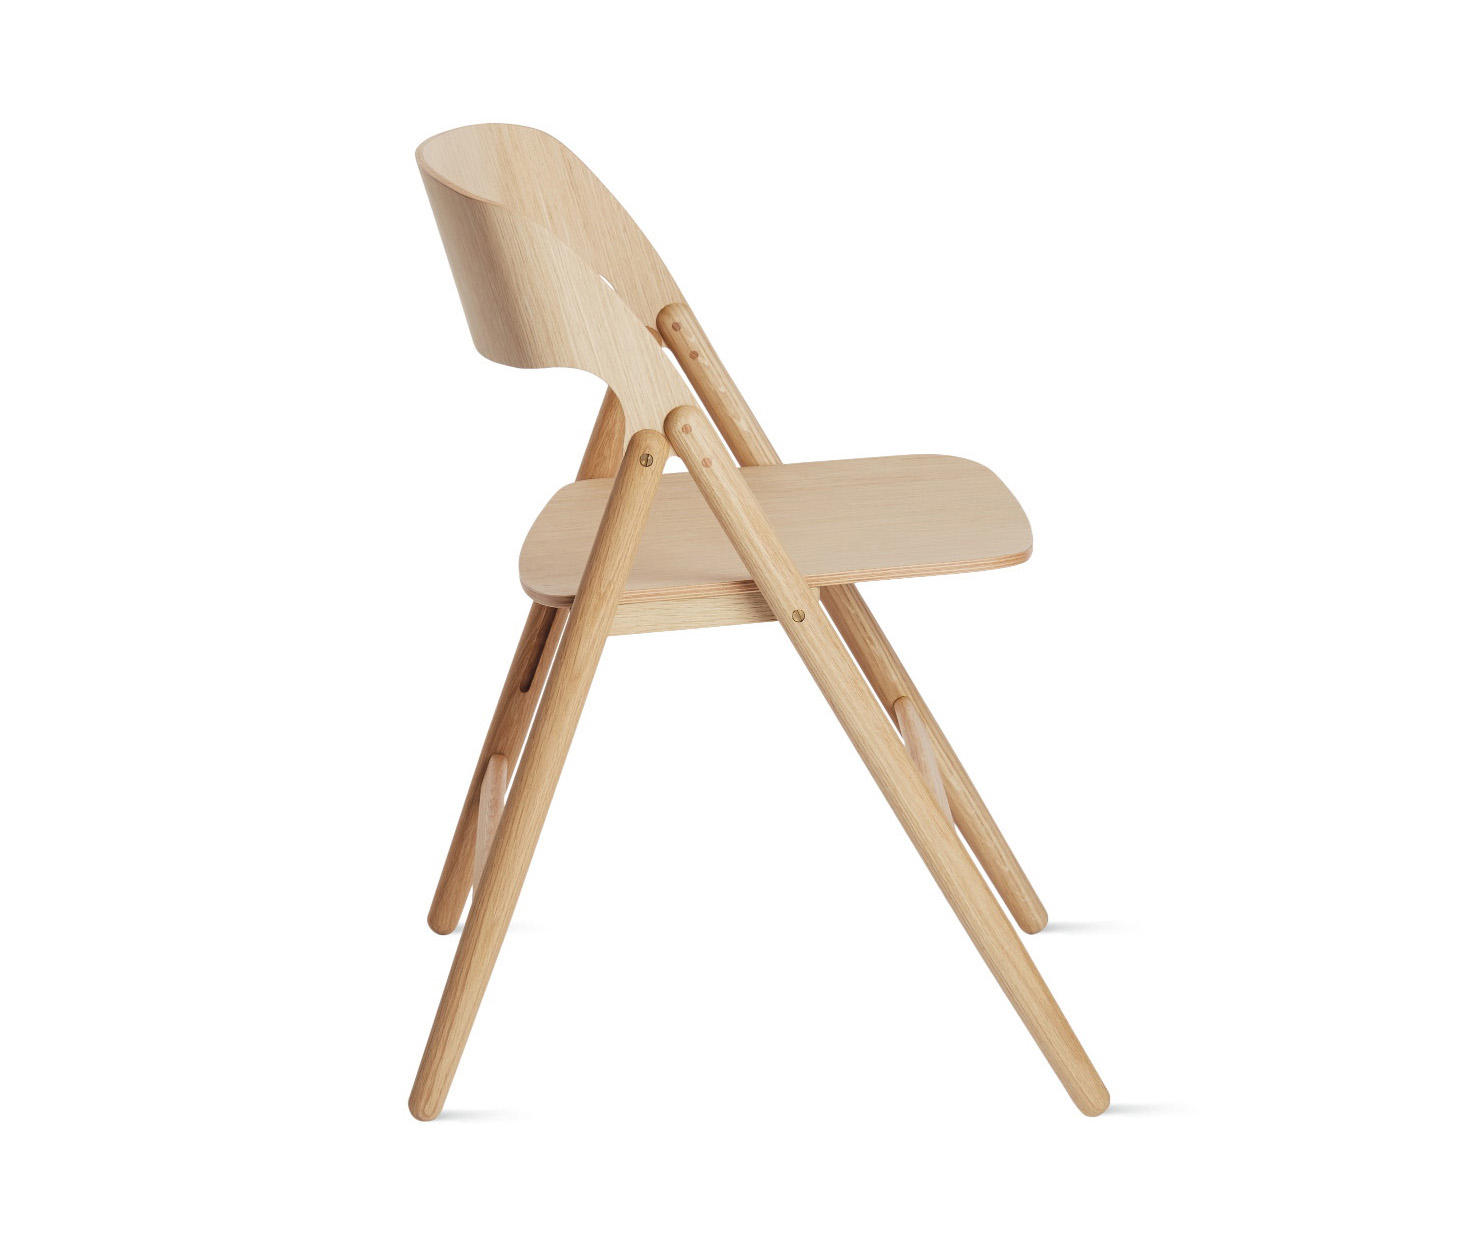 Awe Inspiring Narin Folding Chair Designer Furniture Architonic Uwap Interior Chair Design Uwaporg